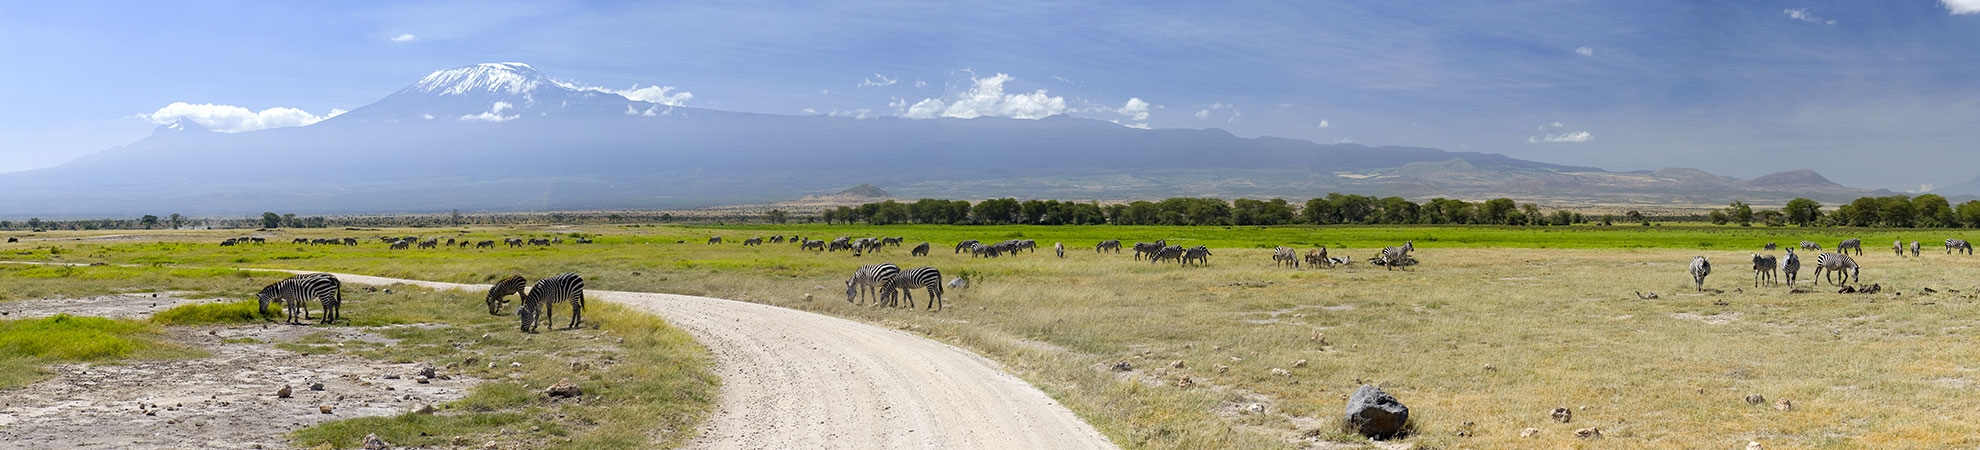 Voyage Mount Kilimanjaro National Park